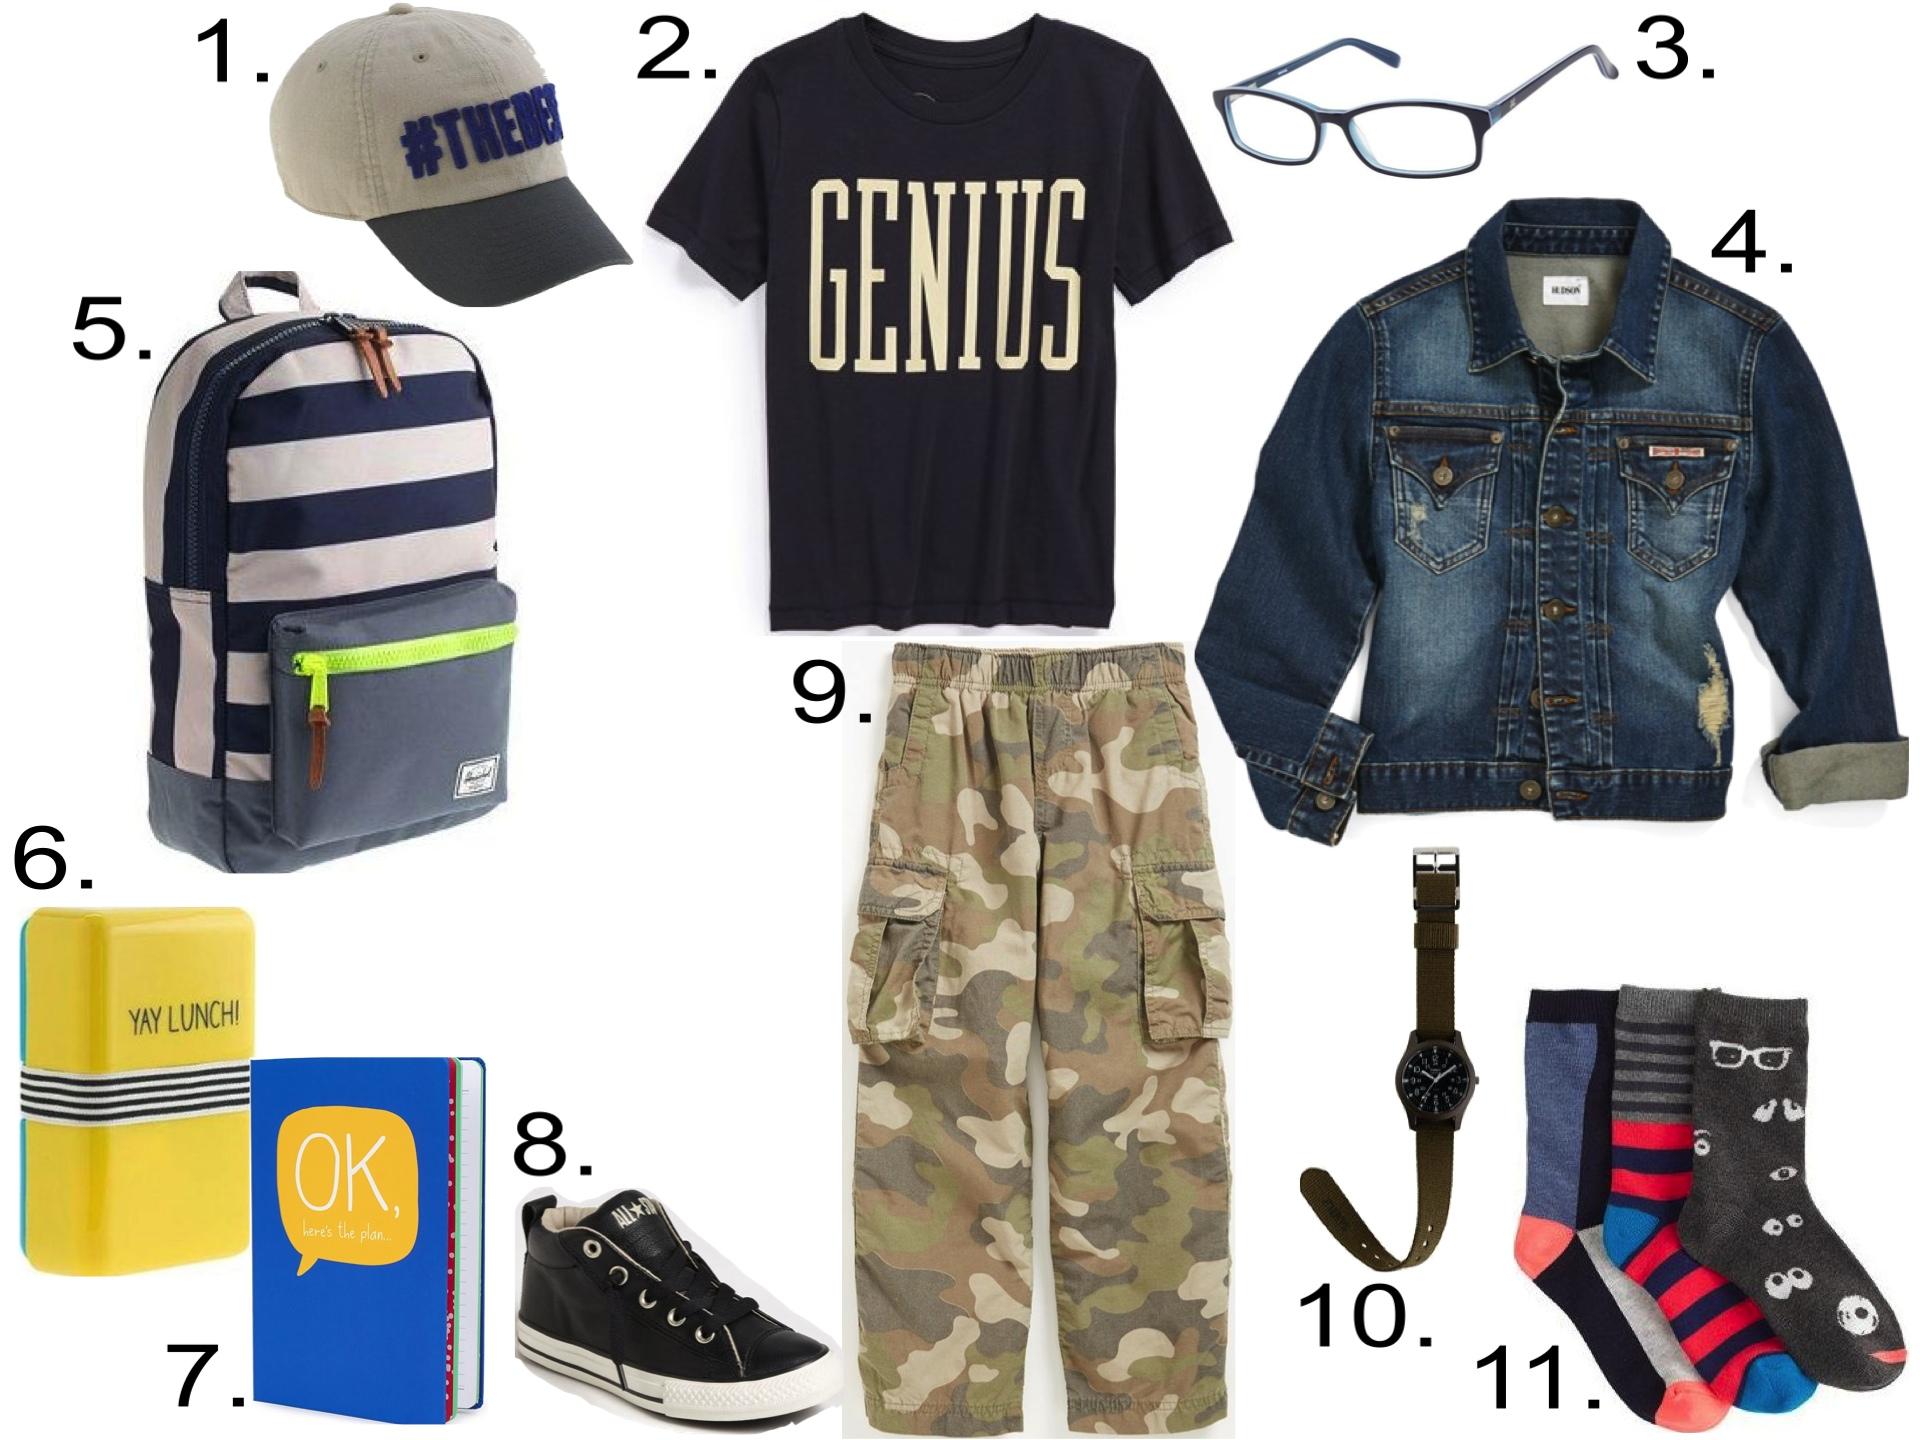 His 1st Day of School... 1.  J.Crew #THEBEST BASEBALL CAP  2.  Peek 'Genius' Graphic T-Shirt  3.  Zooventure Gummy Eyewear  4.  Hudson Kids Jean Jacket  5.  HERSCHEL SUPPLY CO.® FOR CREWCUTS BACKPACK  6.  HAPPY JACKSON™ YAY LUNCH BOX  7.  Happy Jackson Notebook  8.  Converse 'Street' Mid Sneaker  9. Tucker + Tate 'Zephyr' Camo Cargo Pants  10.  TIMEX® CAMPER WATCH WITH INTERCHANGEABLE STRAP  11.  J.Crew GOOGLY EYE TROUSER SOCKS PACK